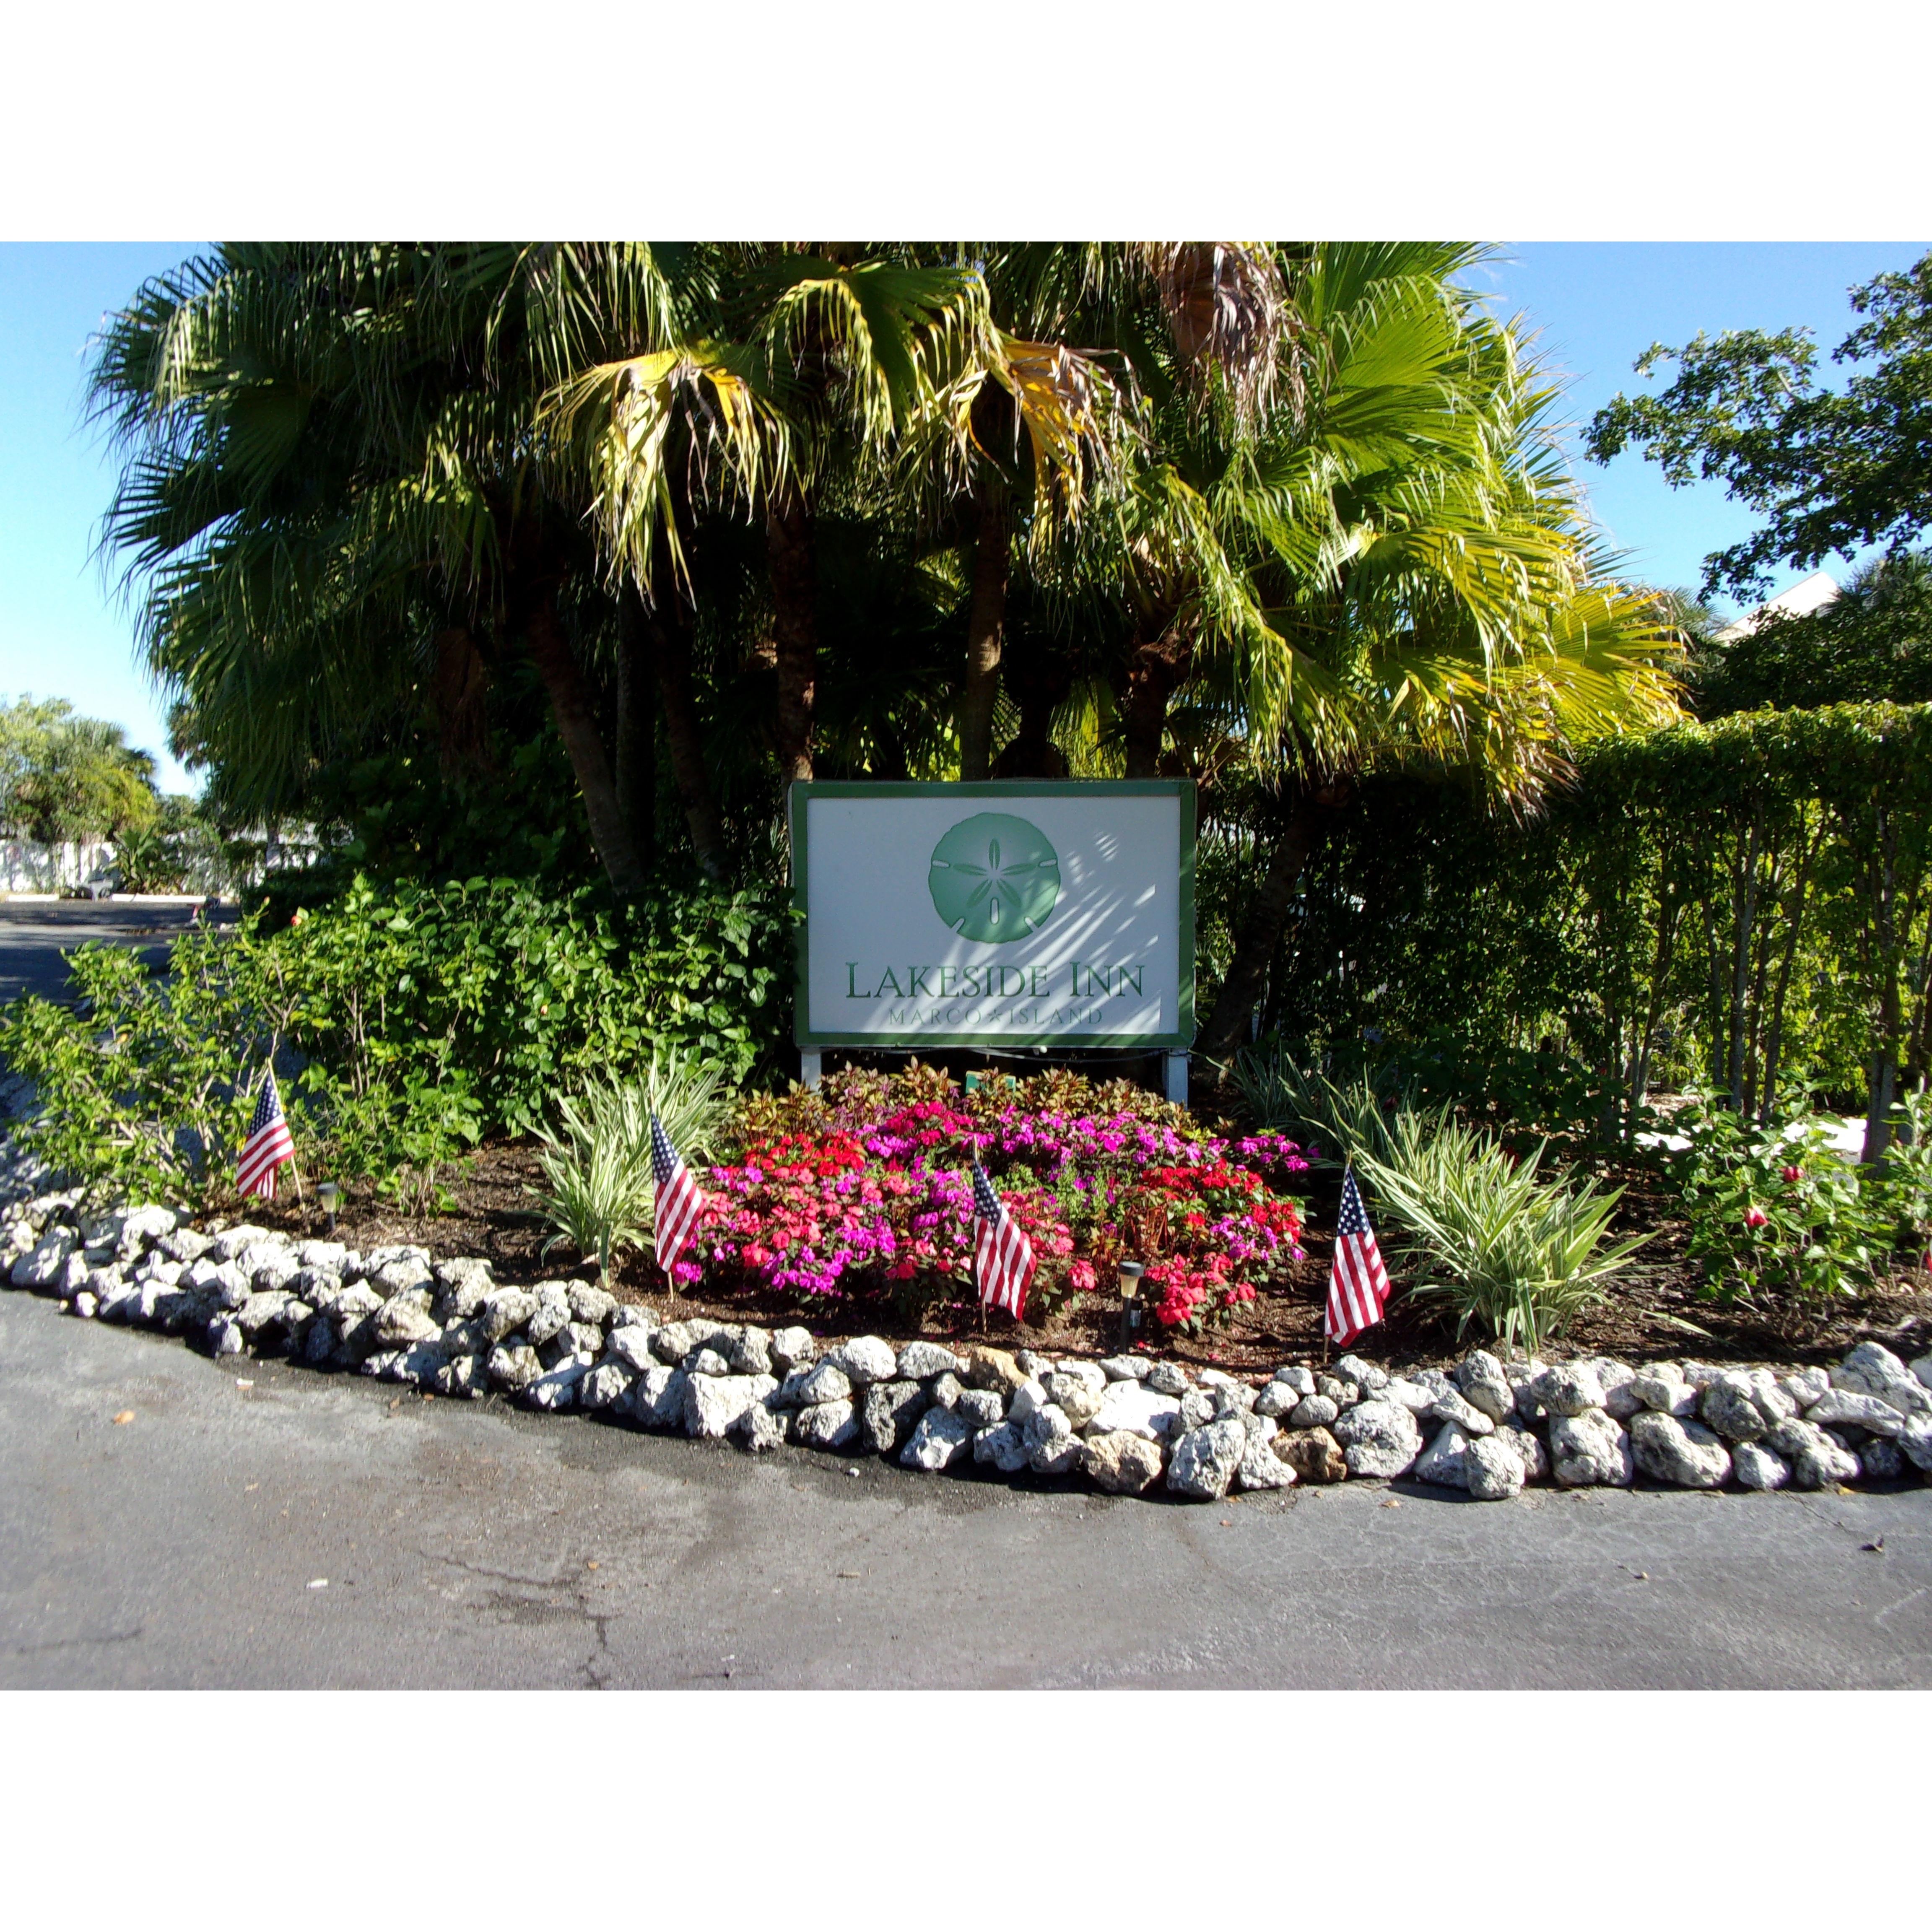 Hotel in FL Marco Island 34145 Marco Island Lakeside Inn 155 1st Ave  (239)394-1161